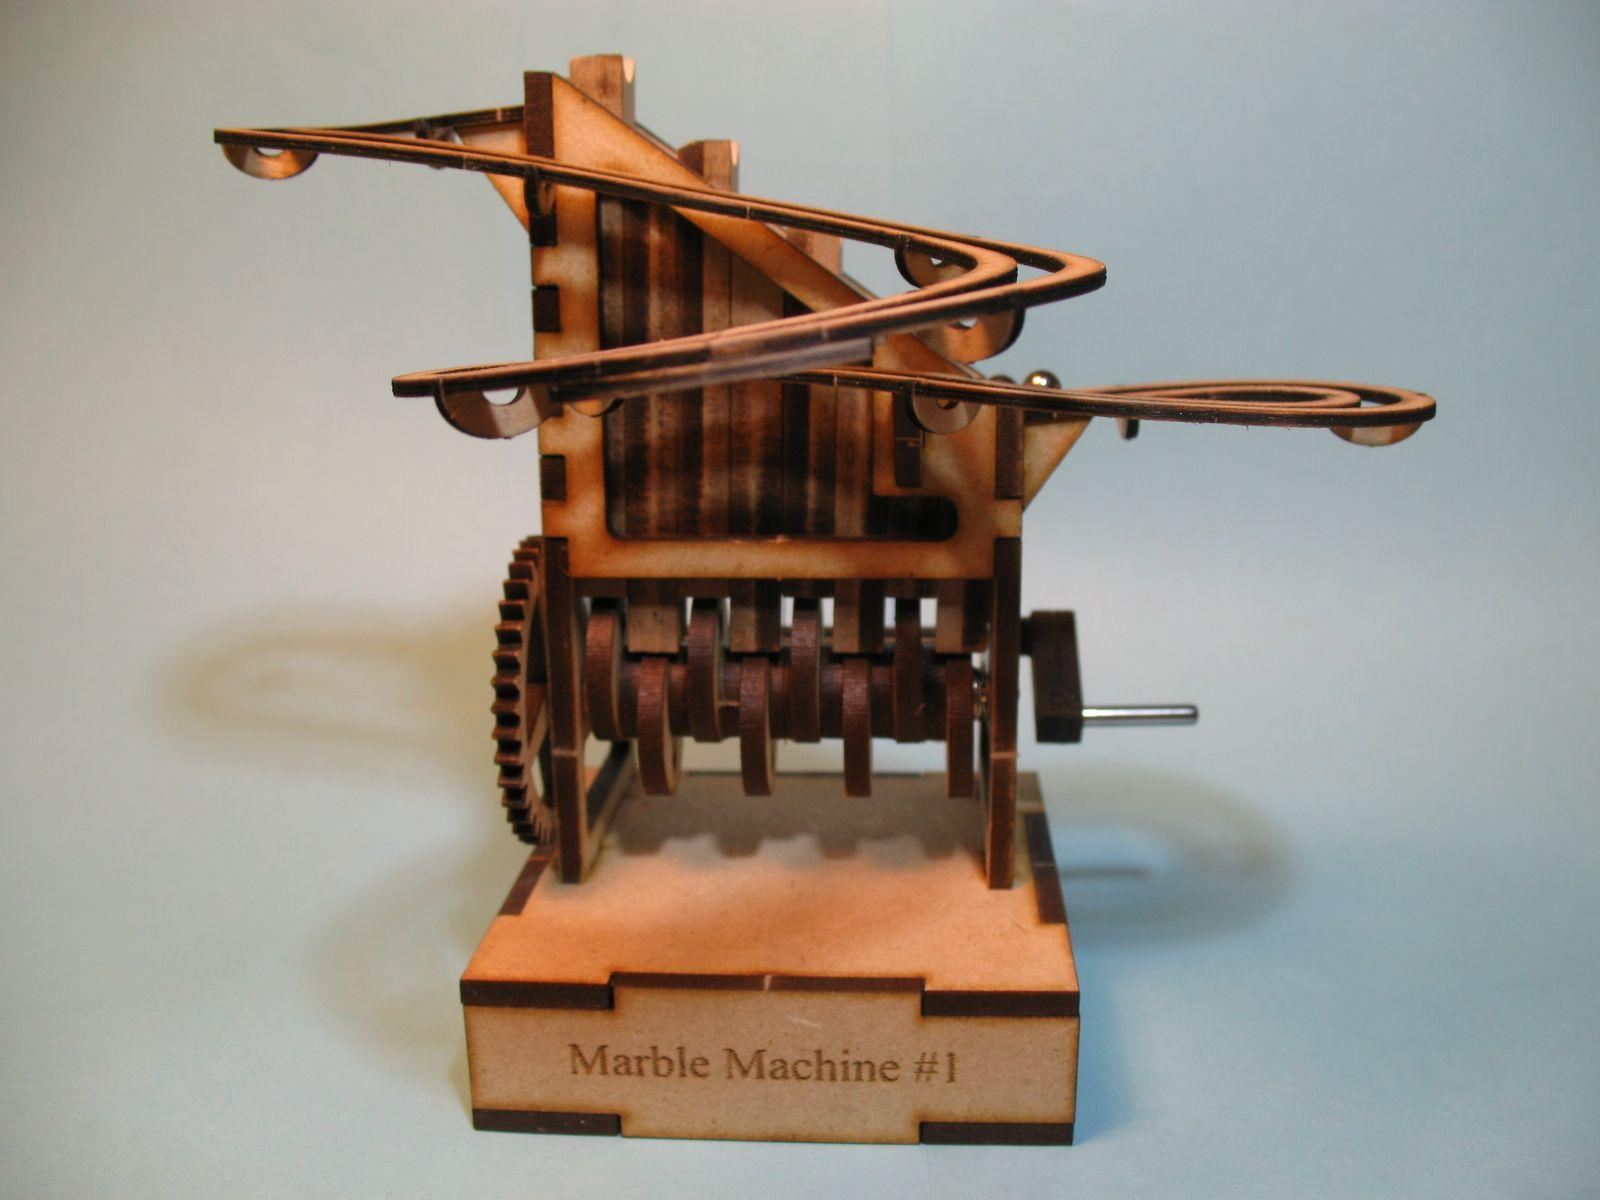 Michael Henriksen's Hand-Cranked Marble Machine